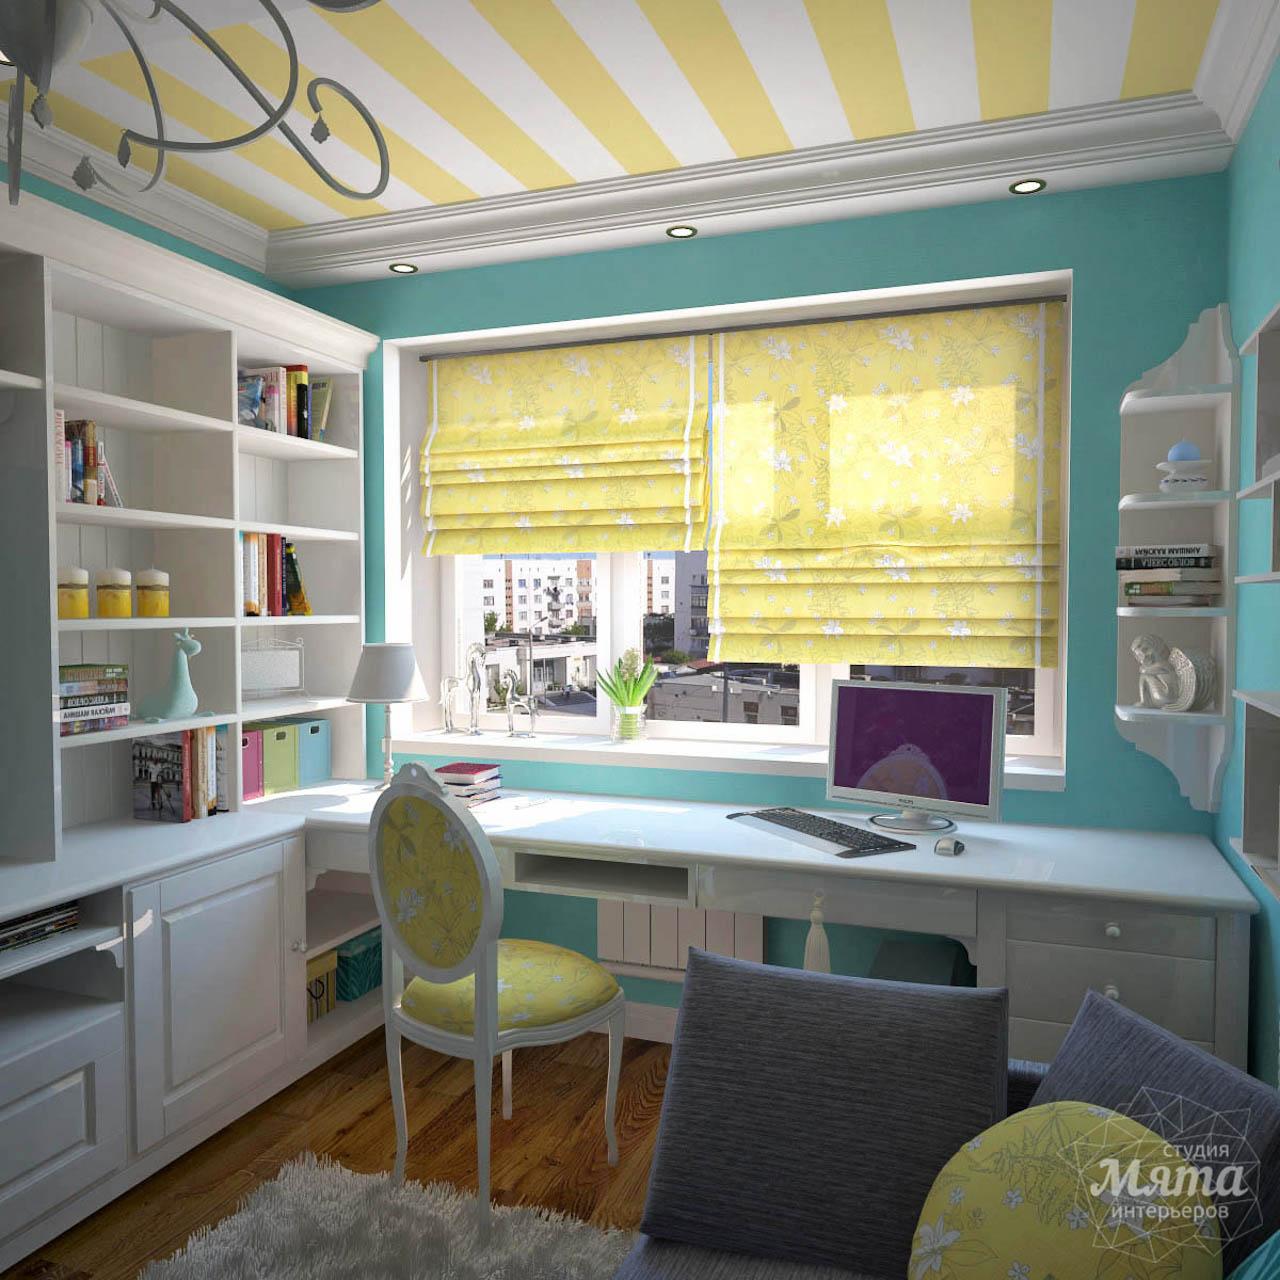 Дизайн интерьера двухкомнатной квартиры по ул. Комсомольская 14 img1689184099